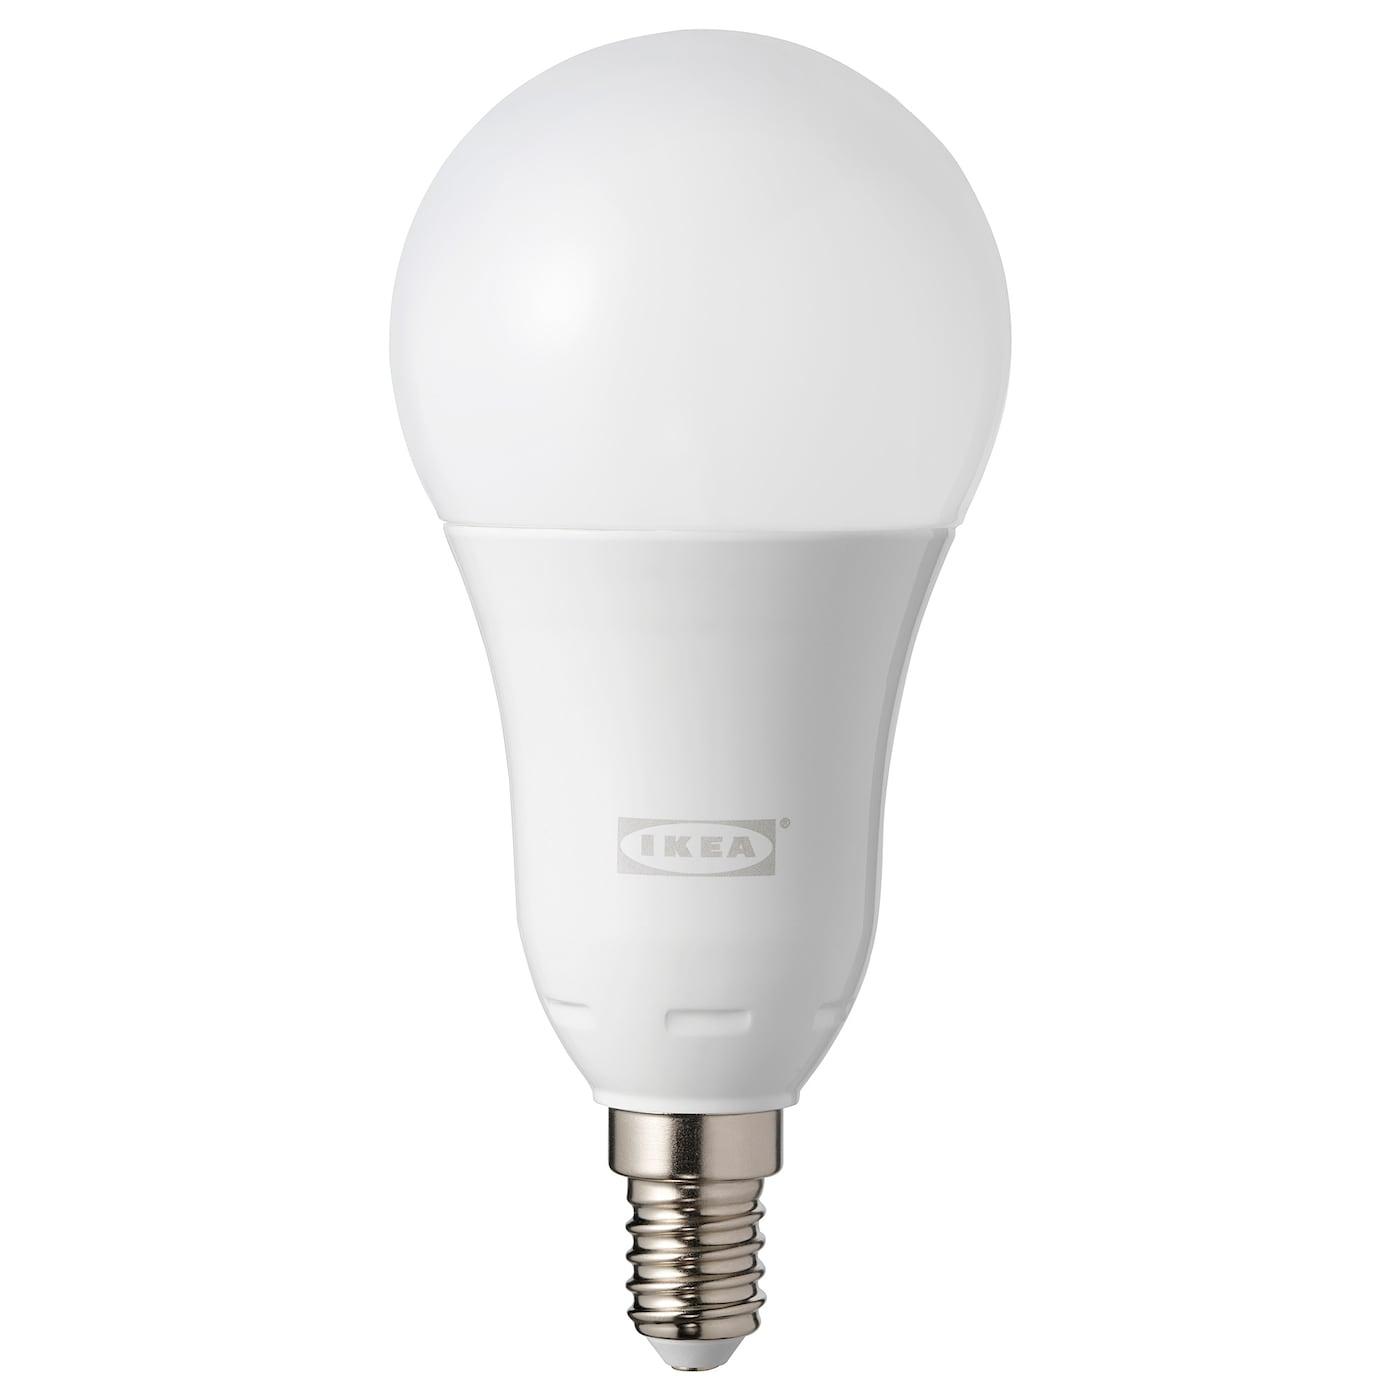 TRÅDFRI LED Leuchtmittel E14 600 lm kabellos dimmbar Farb und Weißspektrumrund opalweiß